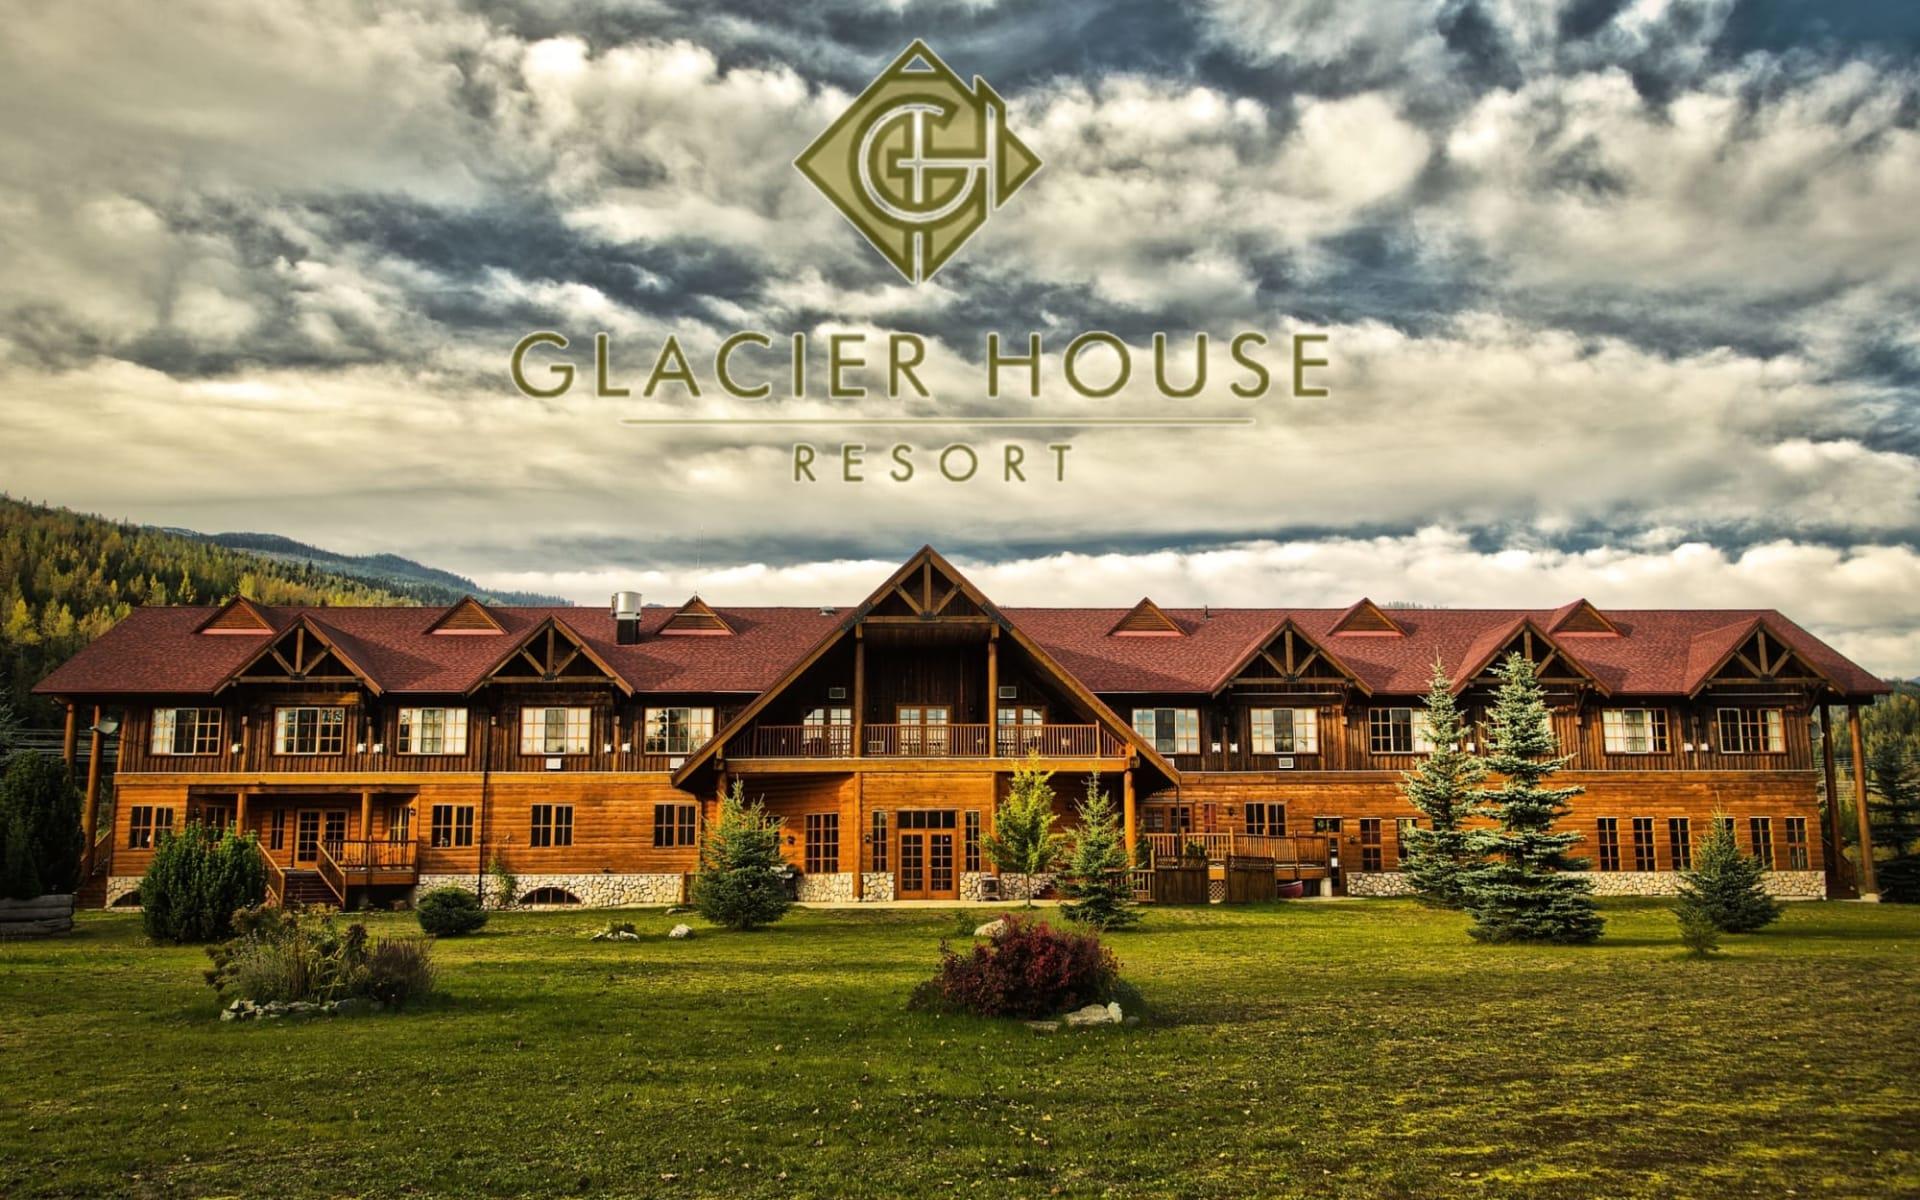 Glacier House Resort in Revelstoke:  Glacier House Resort_Summer